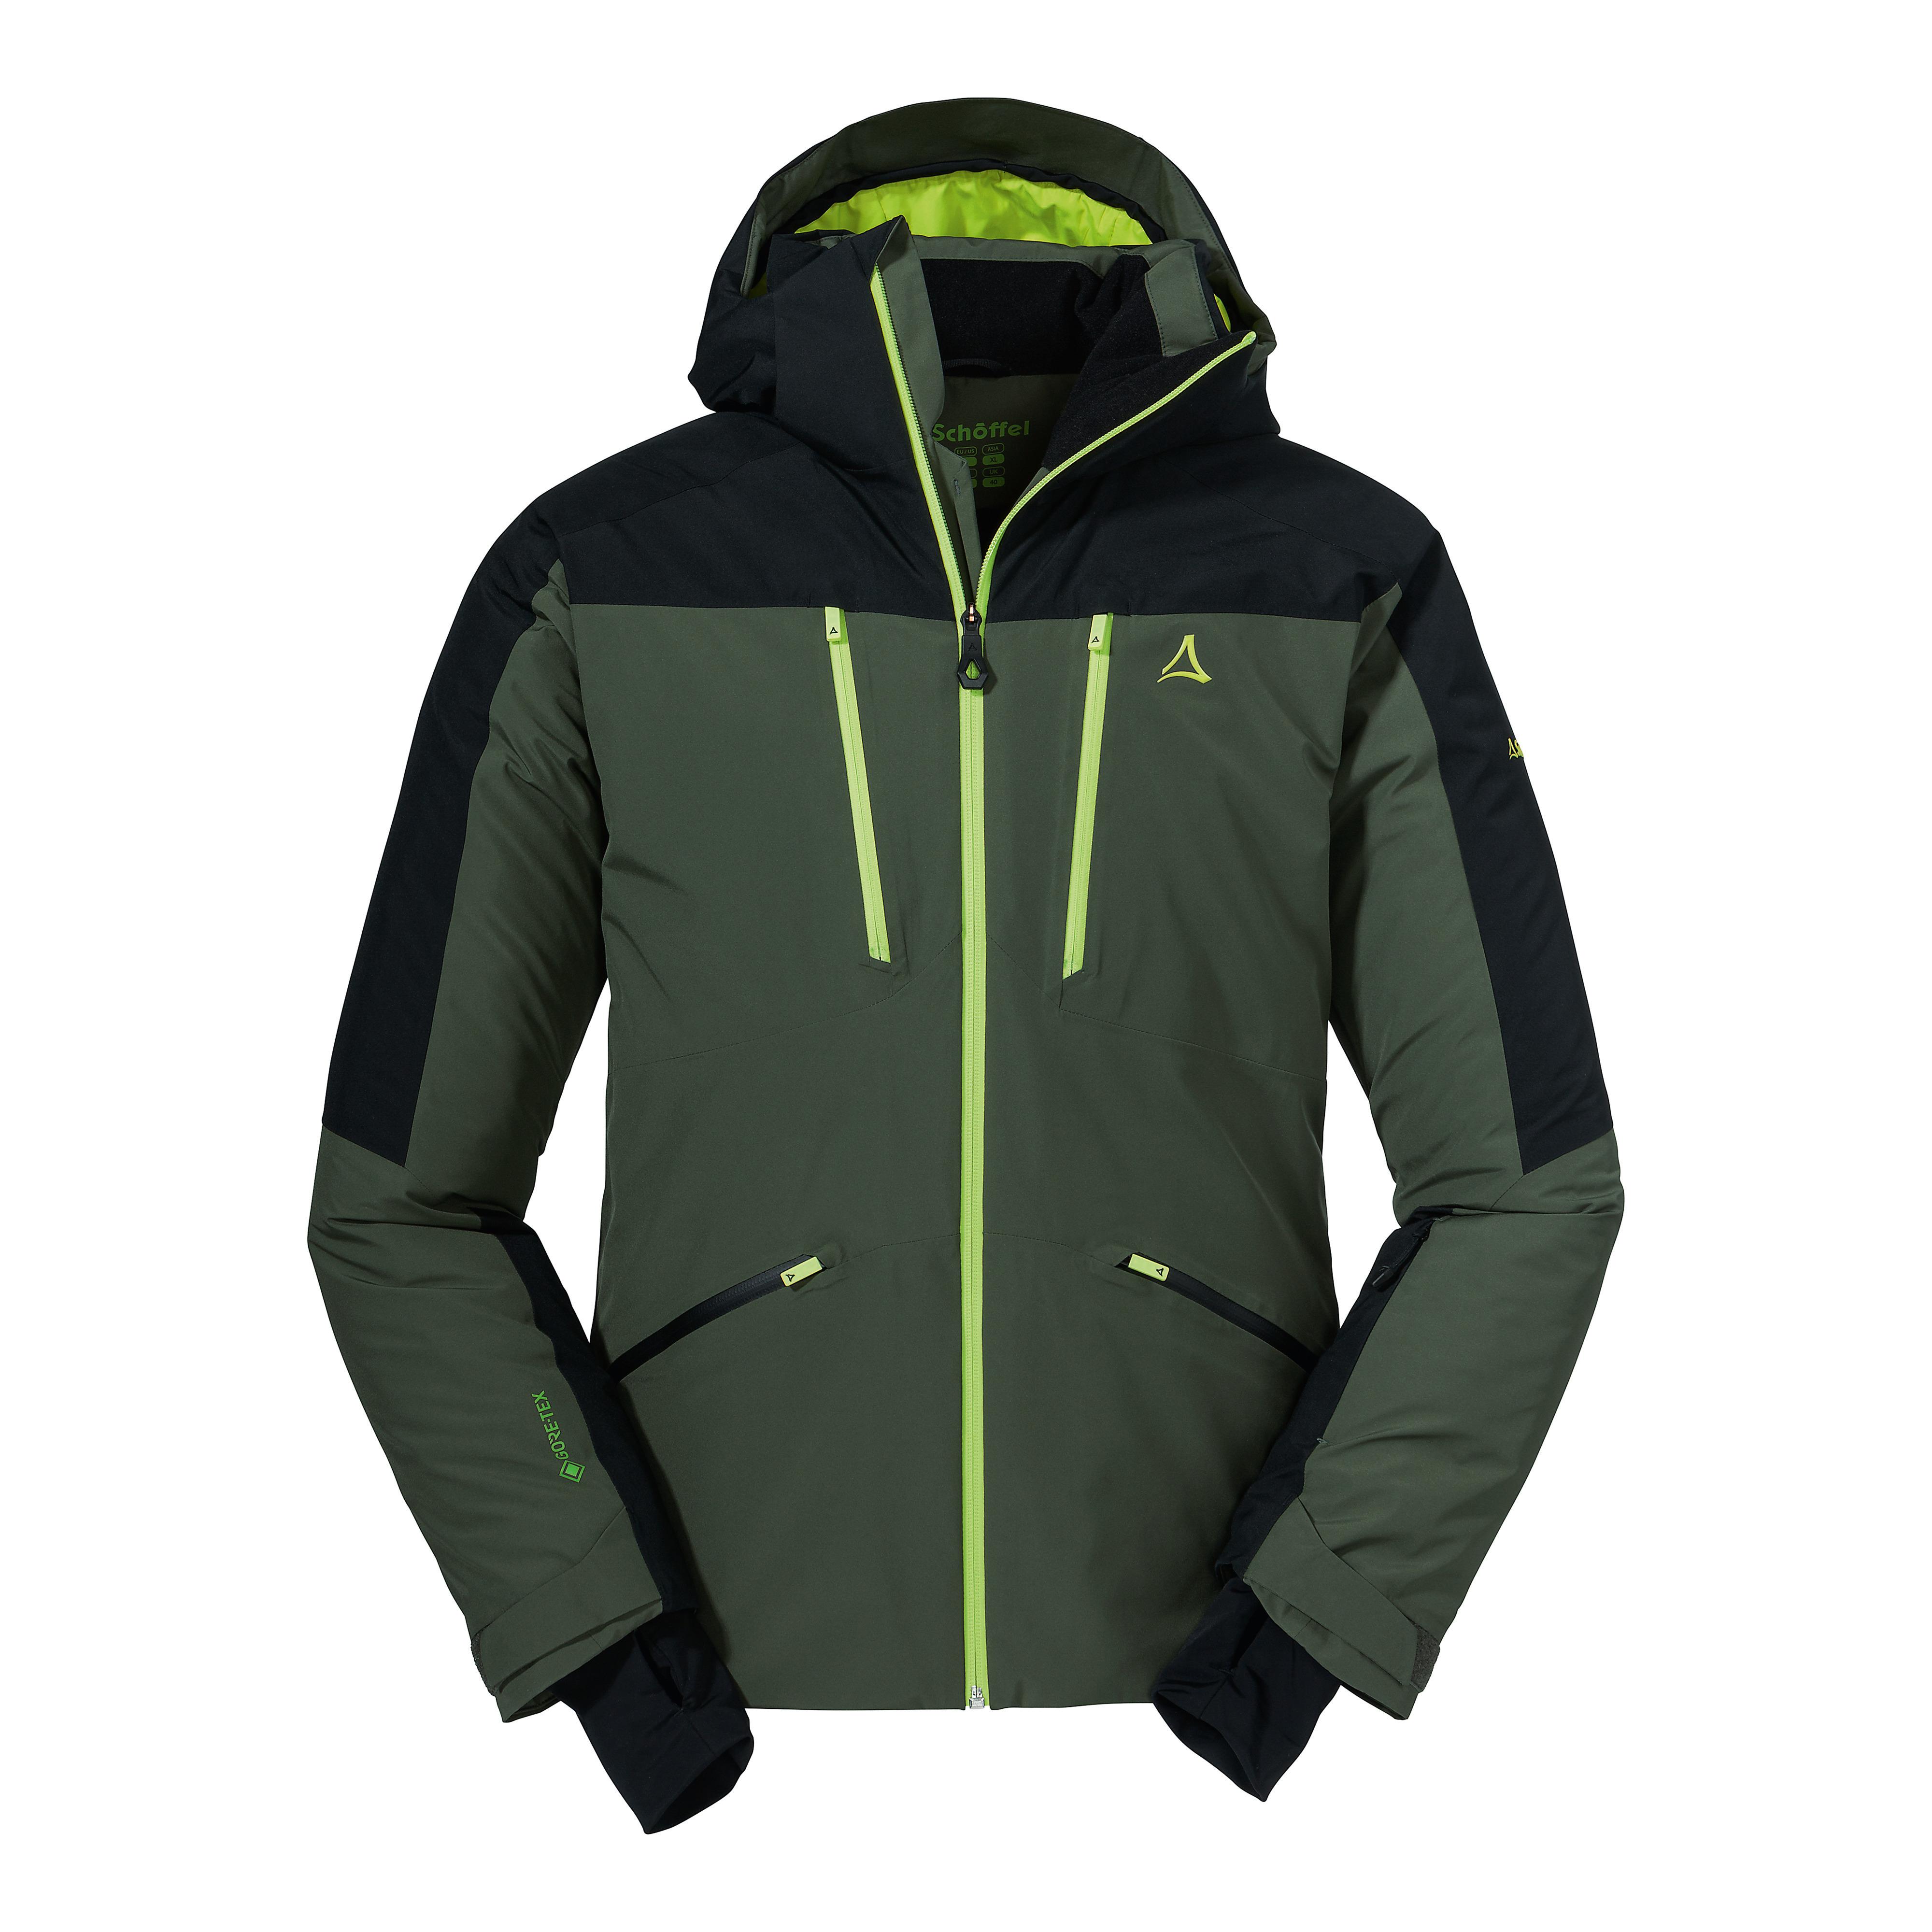 SCHÖFFEL Ski Jacket Lachaux M